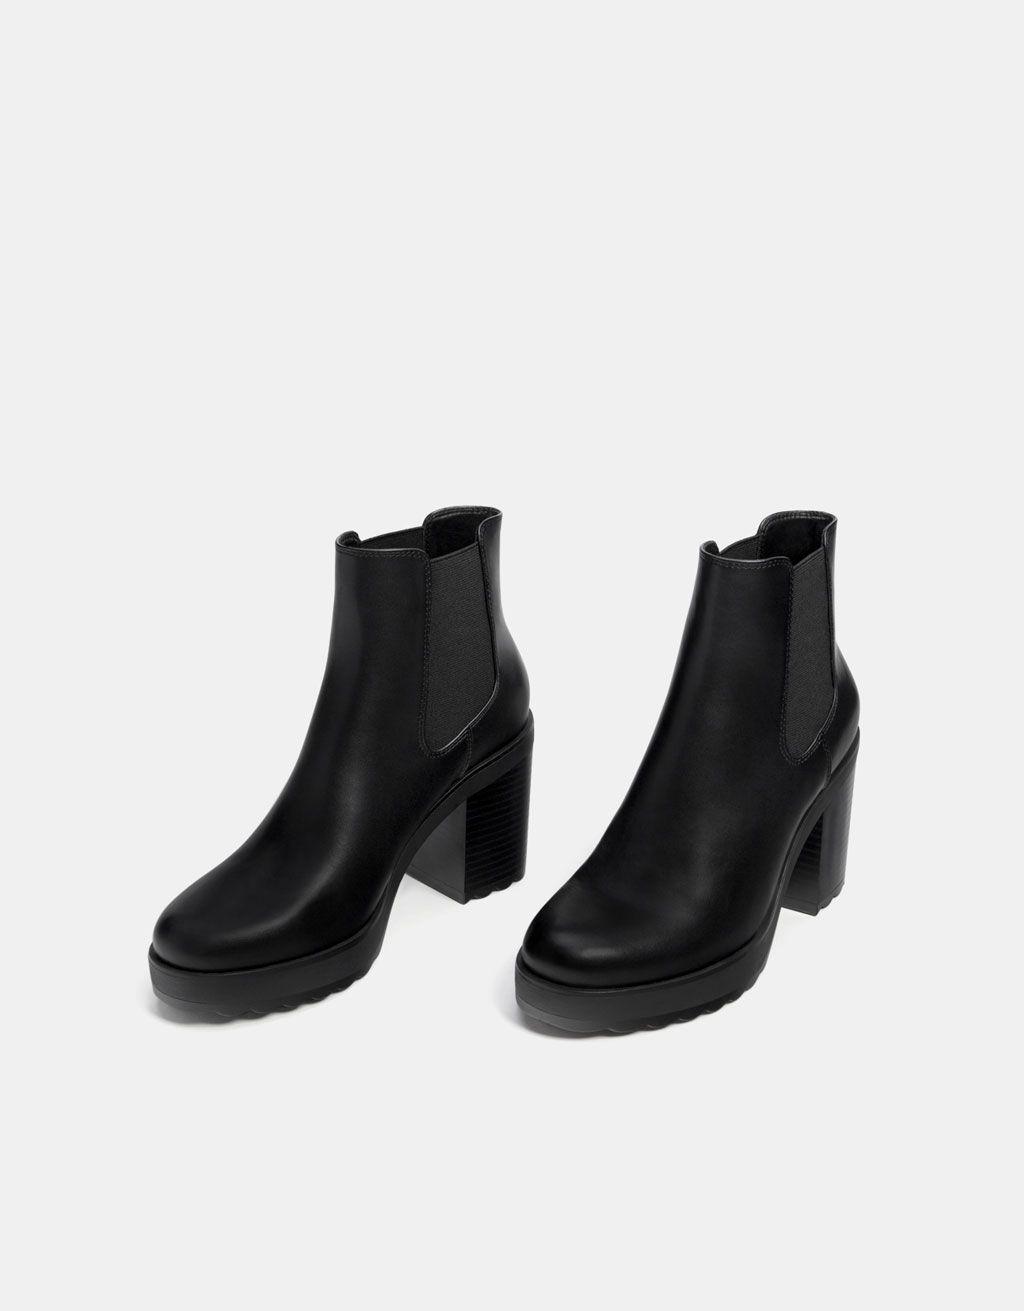 3984de7f0 Rastezljive čizmice na platformu i petu | Zapatos | Zapatos bershka ...